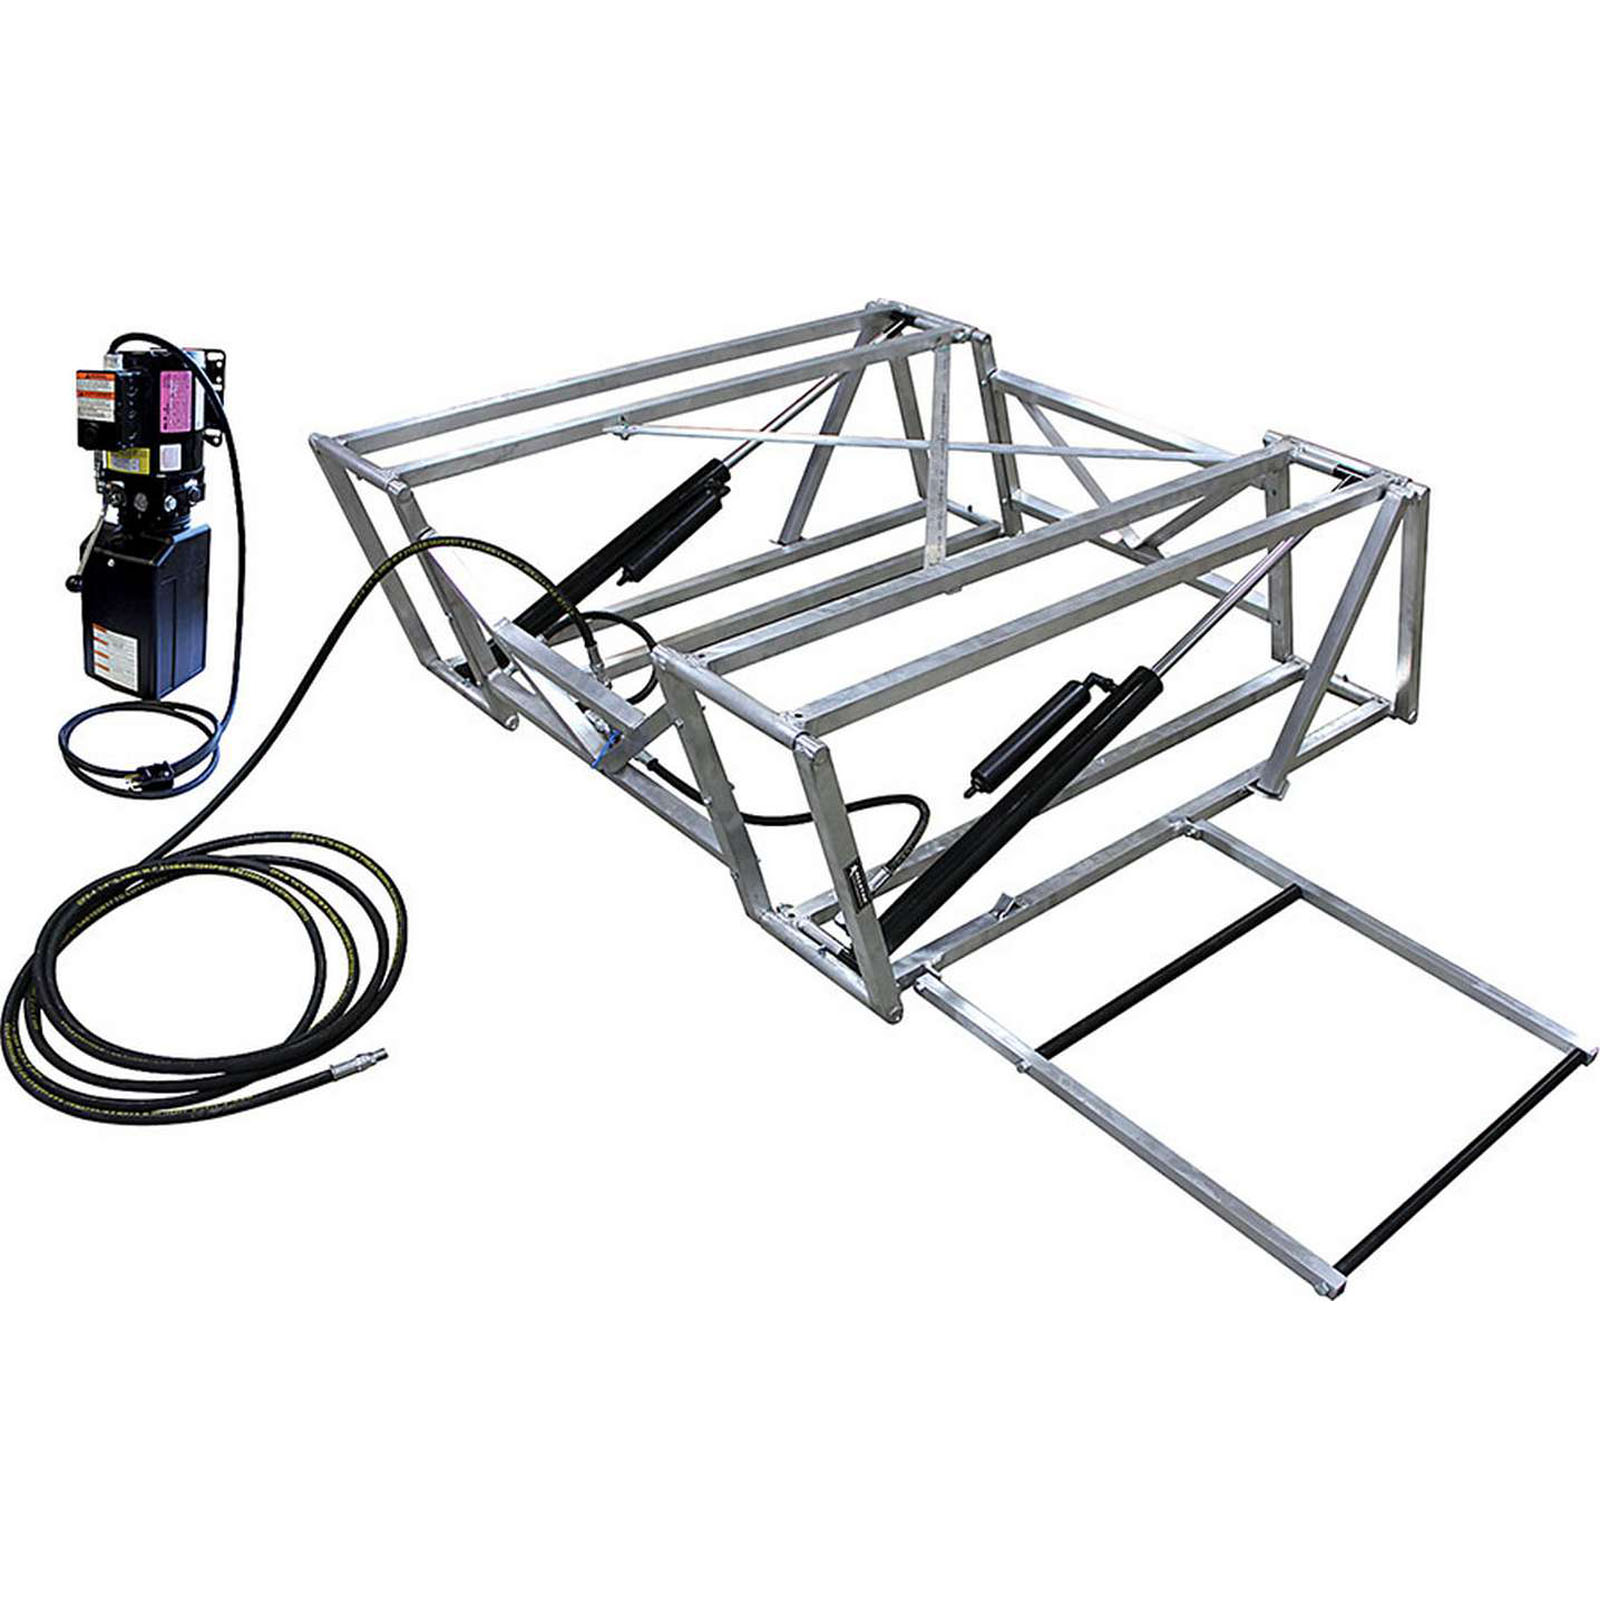 tools  u0026 equipment  u0026gt  shop equipment  u0026 supplies  u0026gt  auto lifts